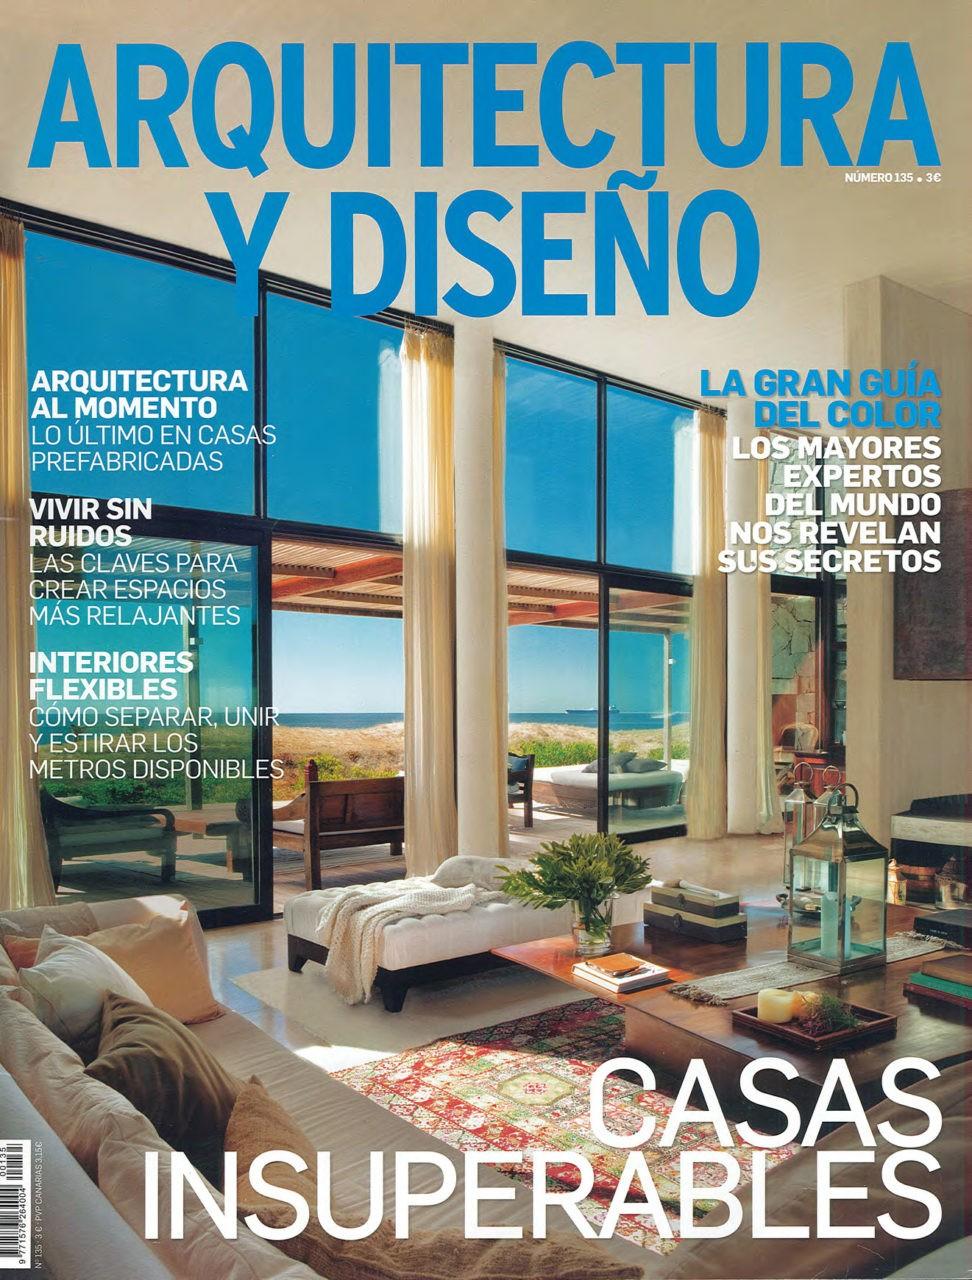 http://www.saota.com/wp-content/uploads/2018/01/2012_Issue_135_ArquitecturaYDiseno_SAOTA_Page_1.jpg